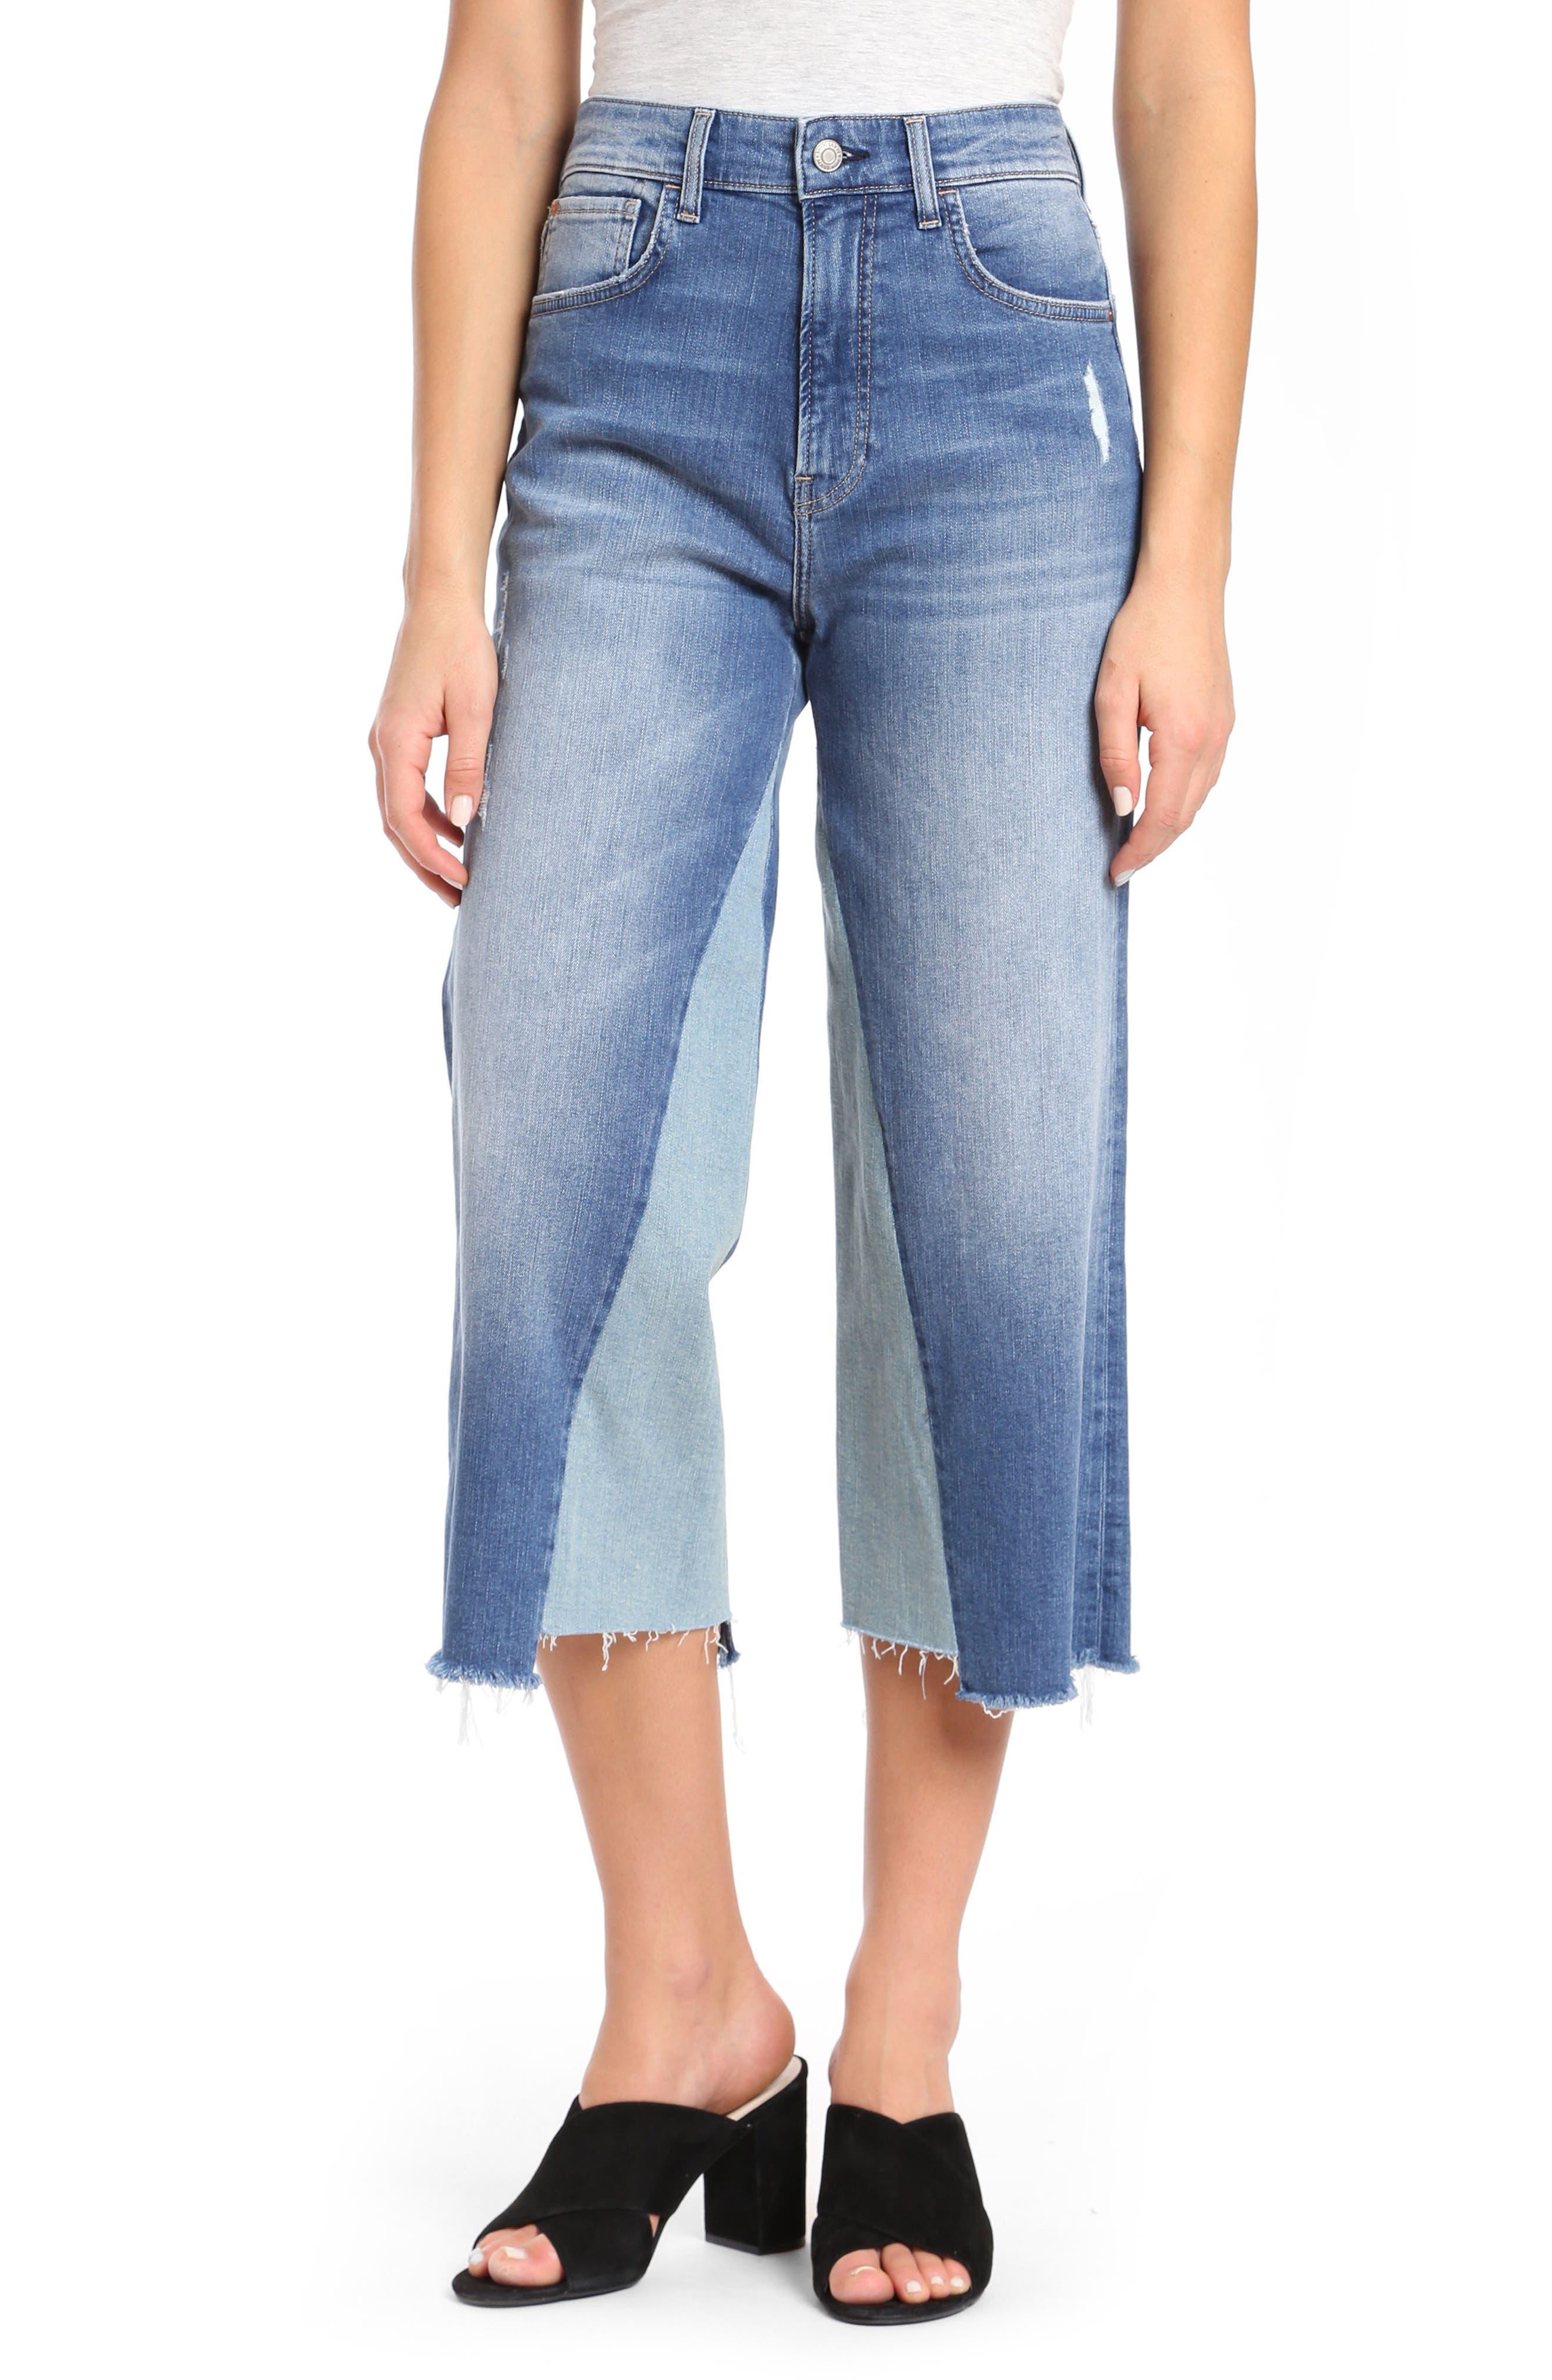 Elliott Wide Leg Contrast Jeans,                             Main thumbnail 1, color,                             Mid Shadow